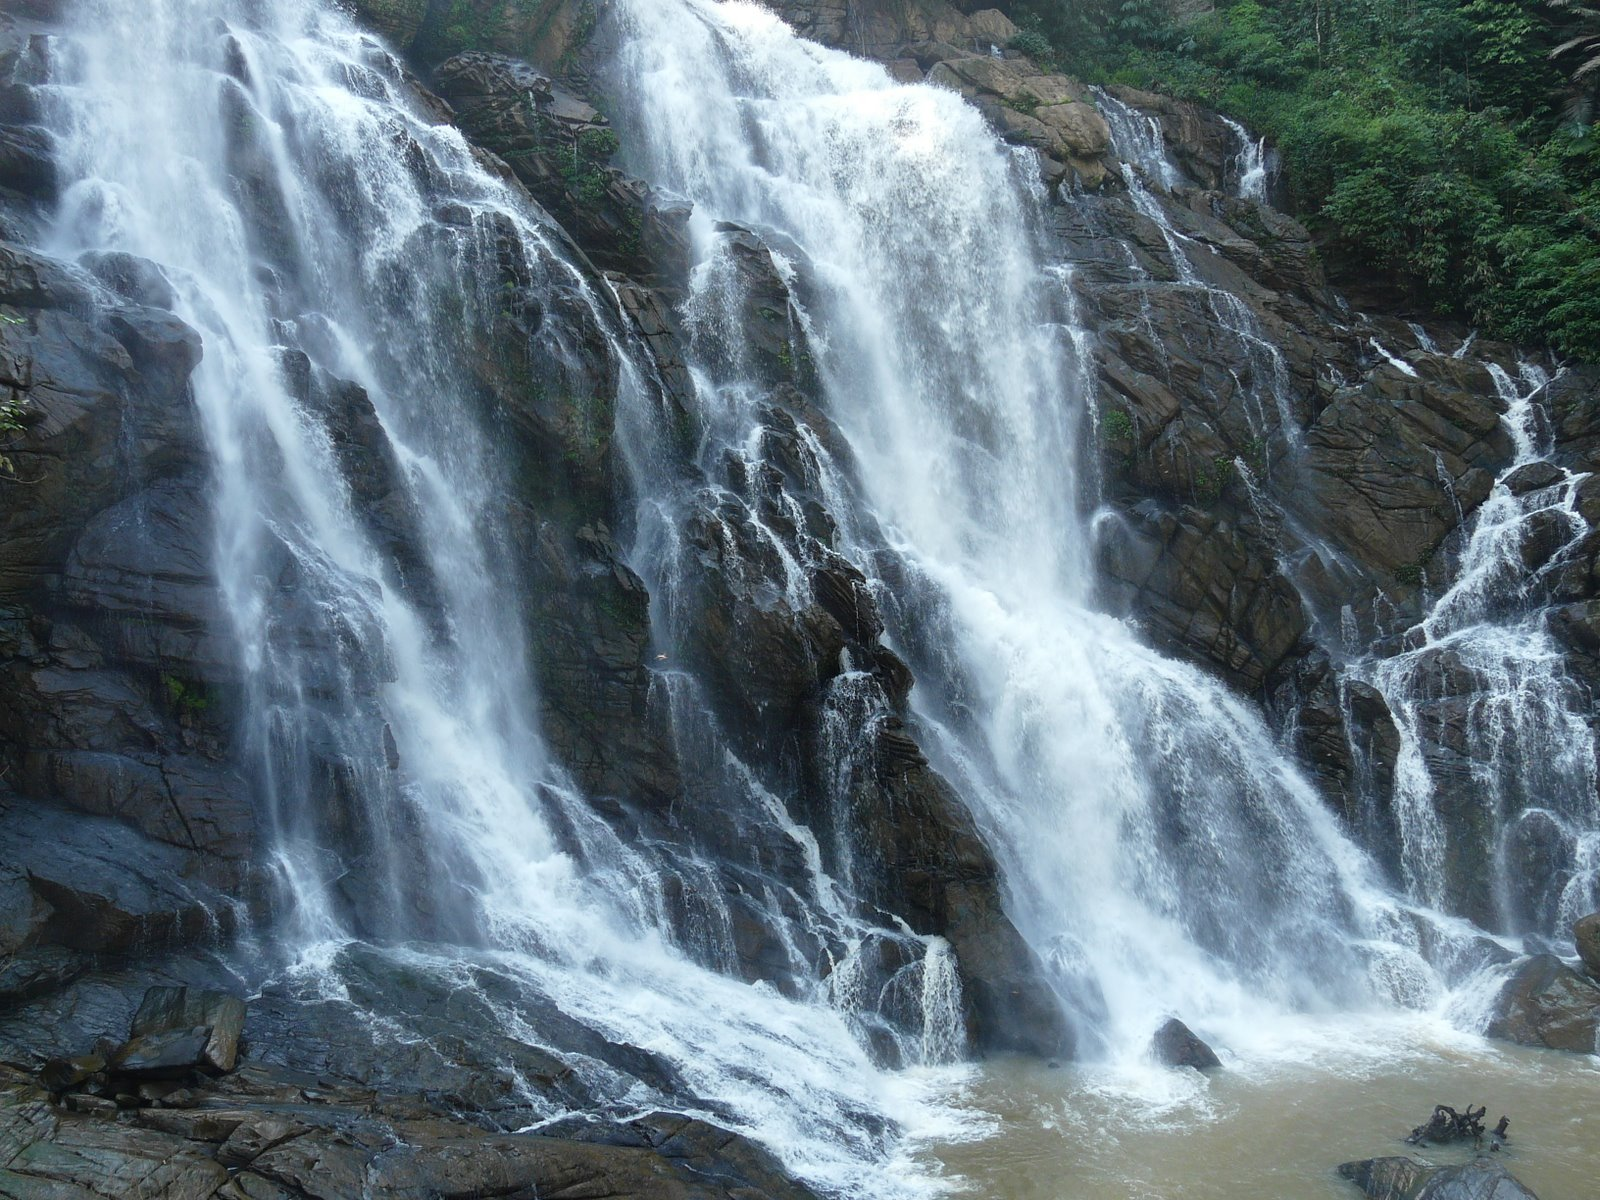 Meenmutty Waterfalls, Kalpetta Kalpetta Wayanad